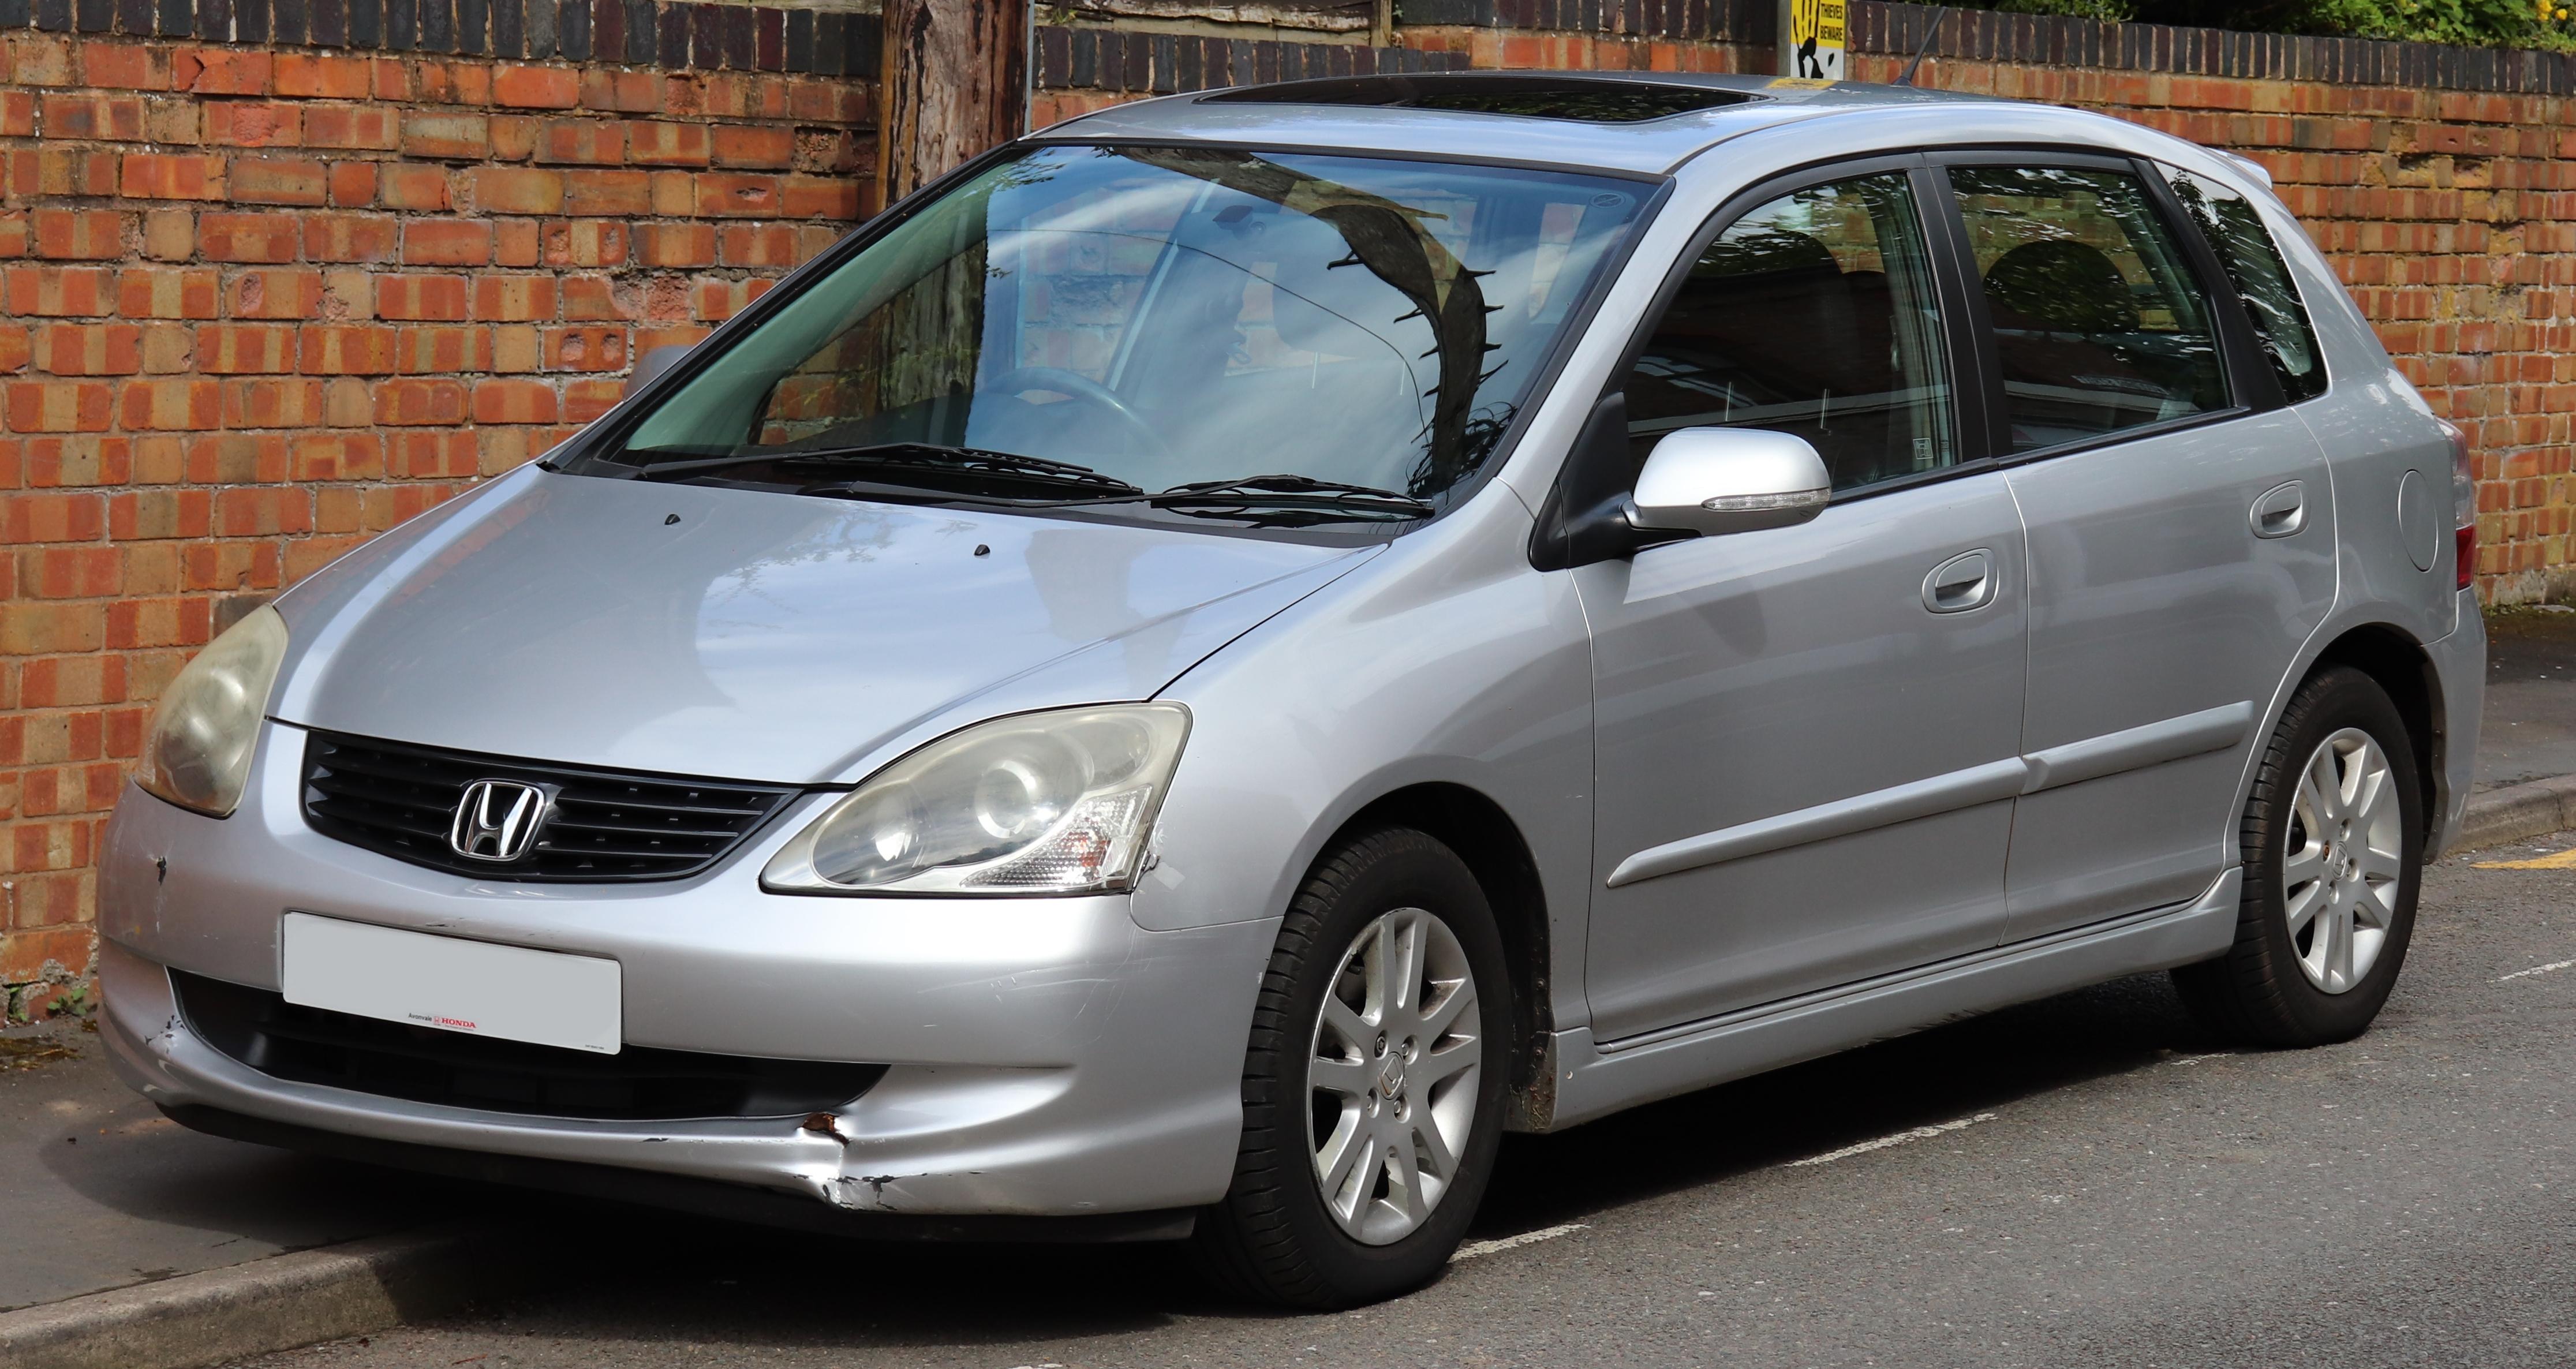 Ficheiro 2004 Honda Civic Vtec Executive 1 6 Front Jpg Wikipedia A Enciclopedia Livre